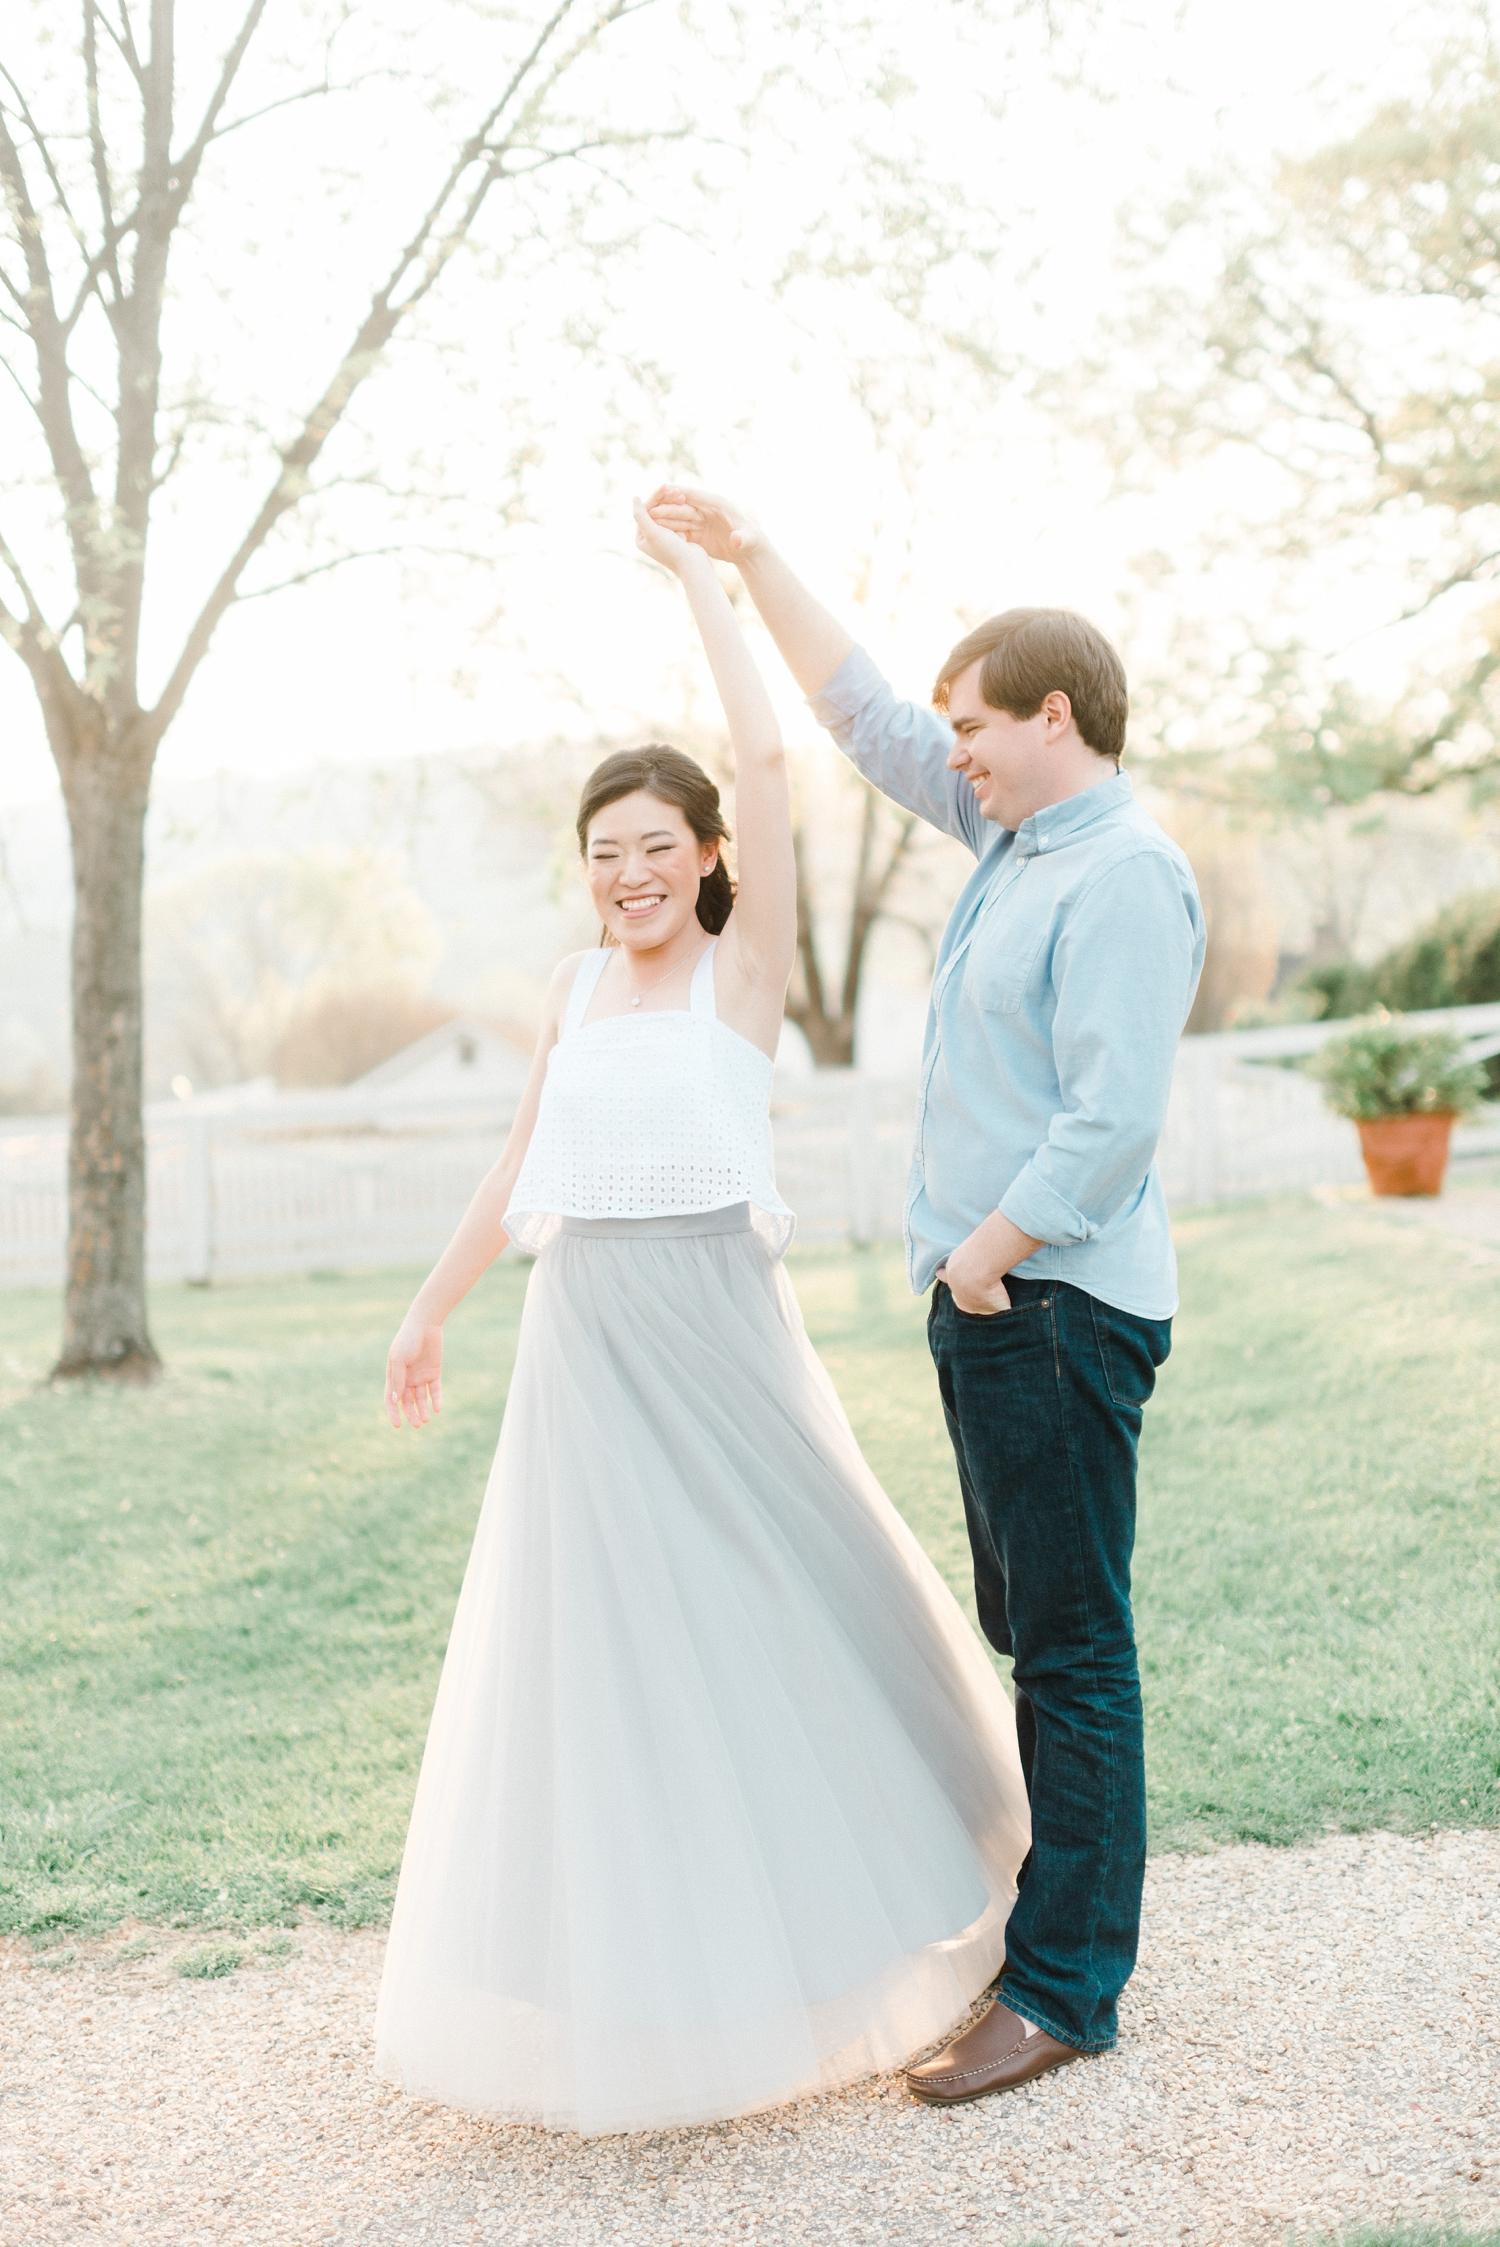 ash_lawn_charlottesville_couples_portraits_0006.jpg